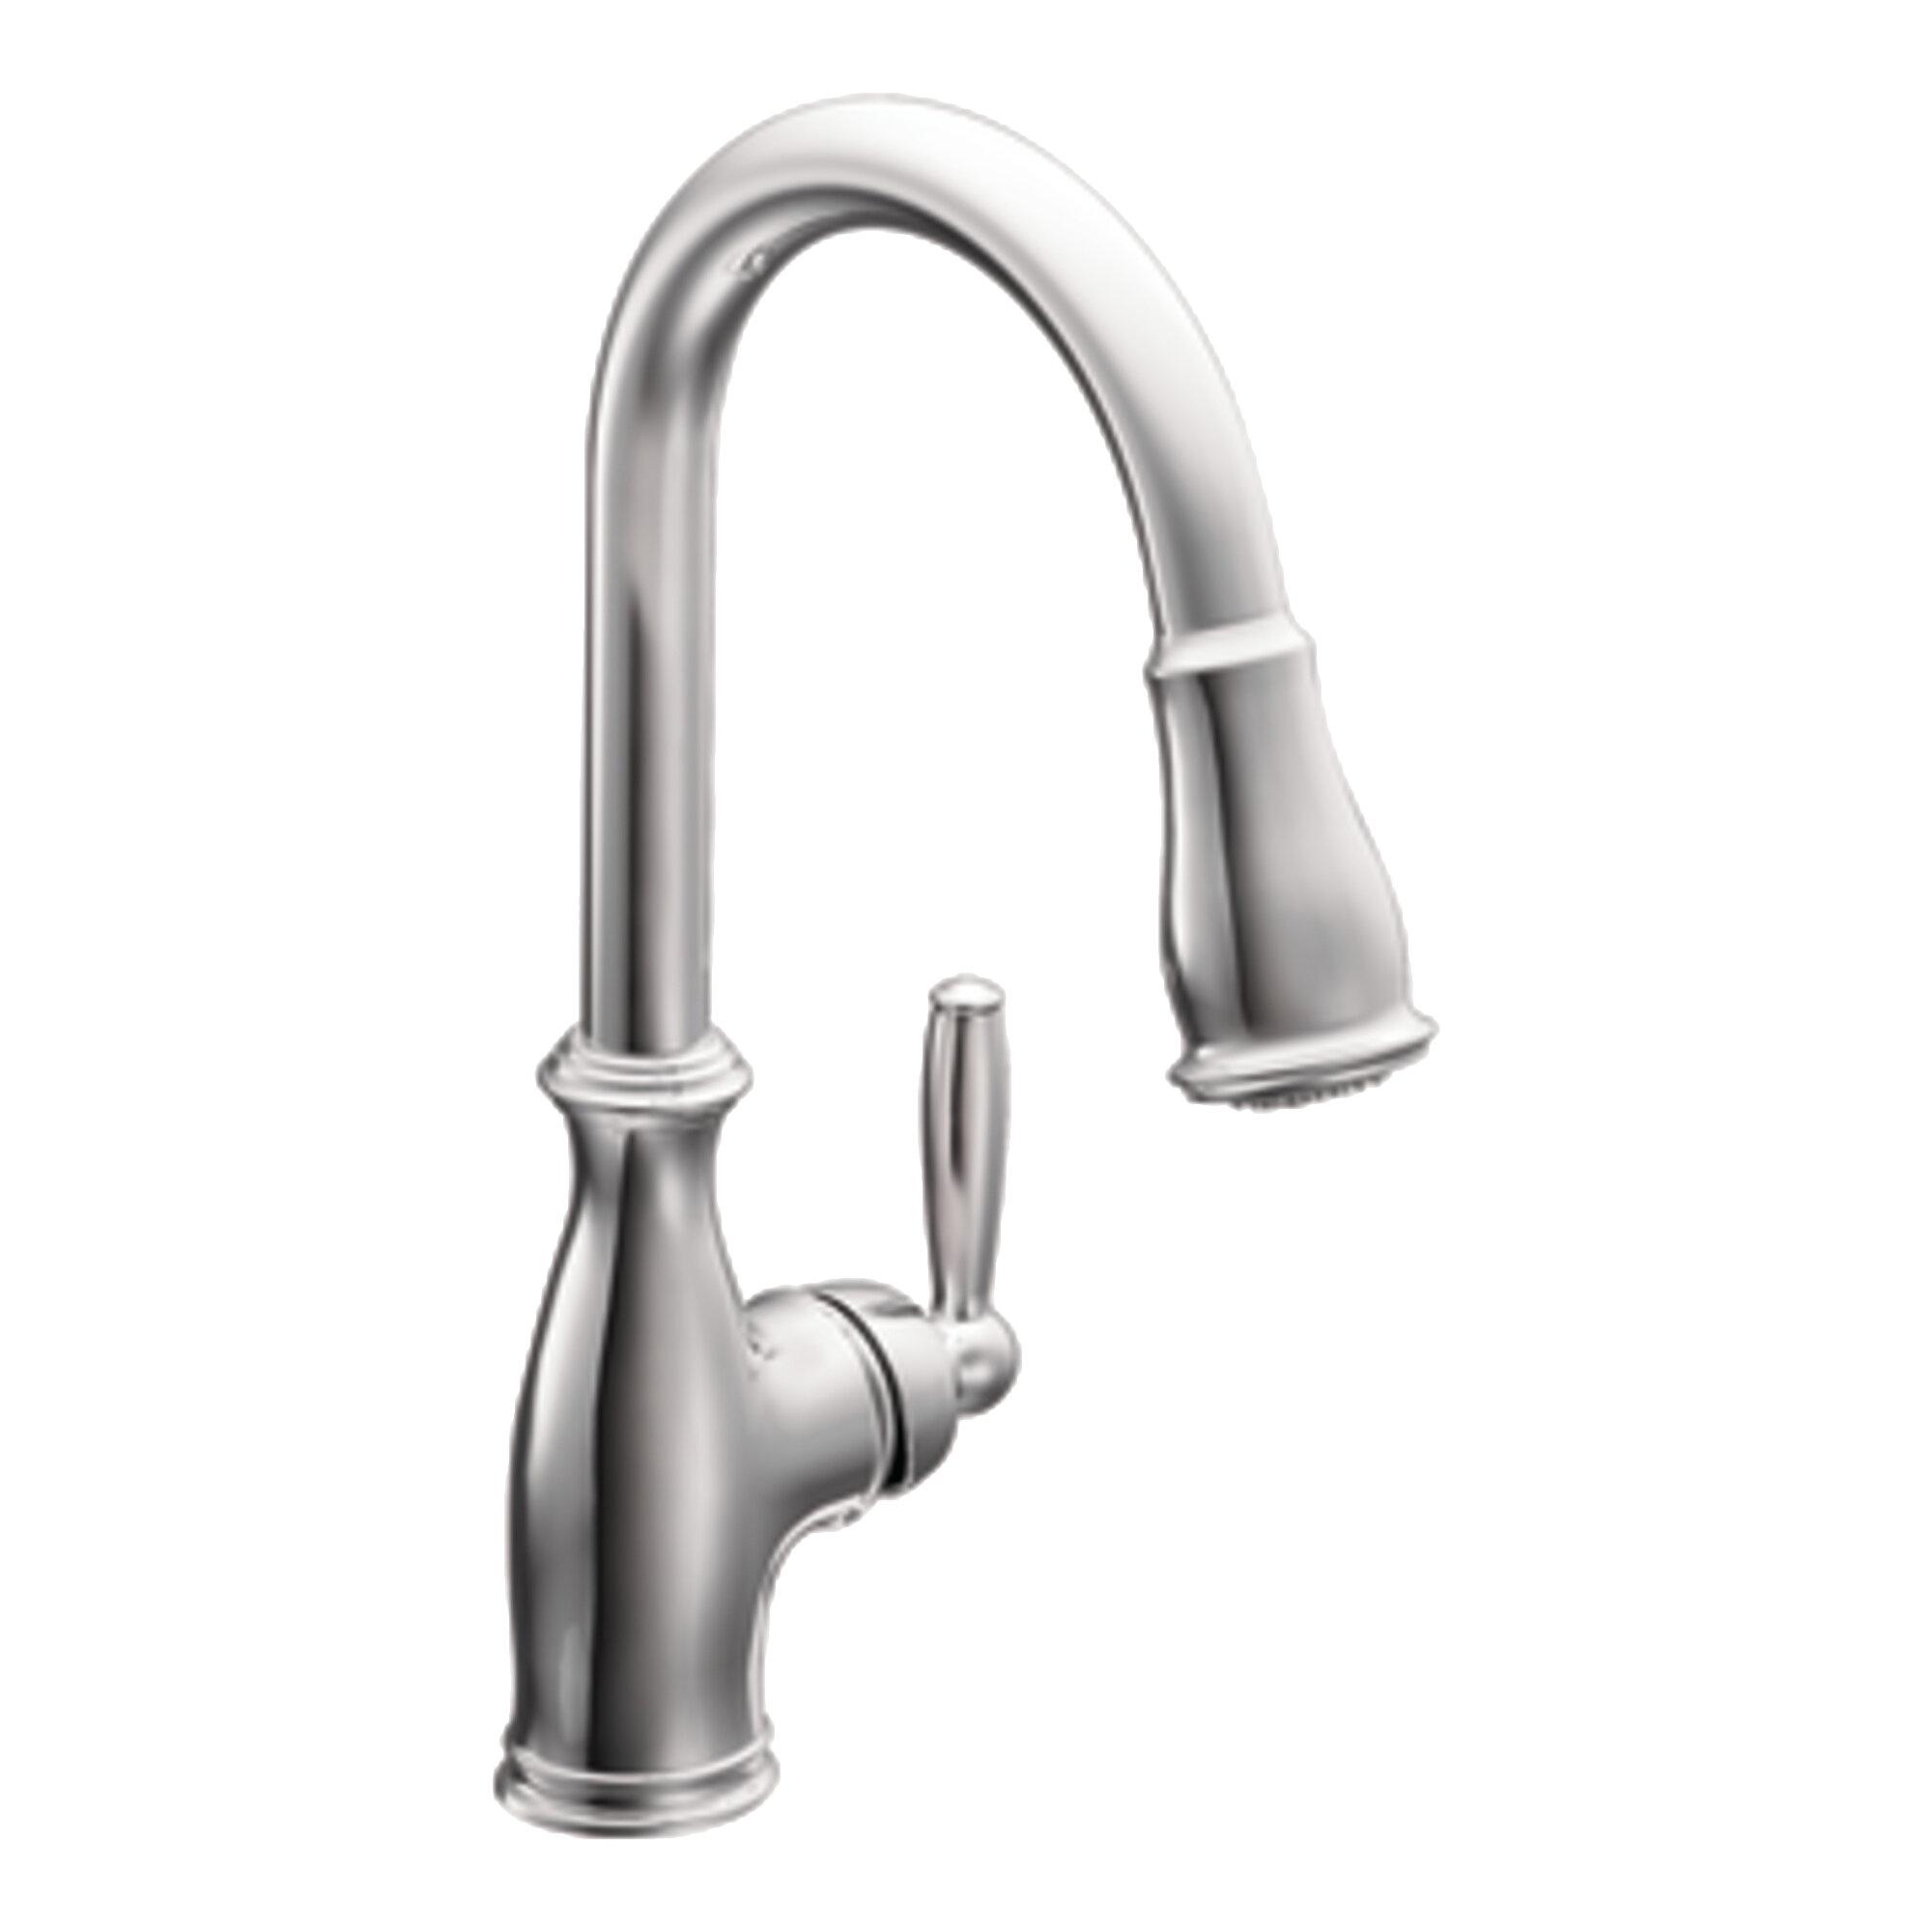 Moen Brantford Pull Down Single Handle Kitchen Faucet with Reflex